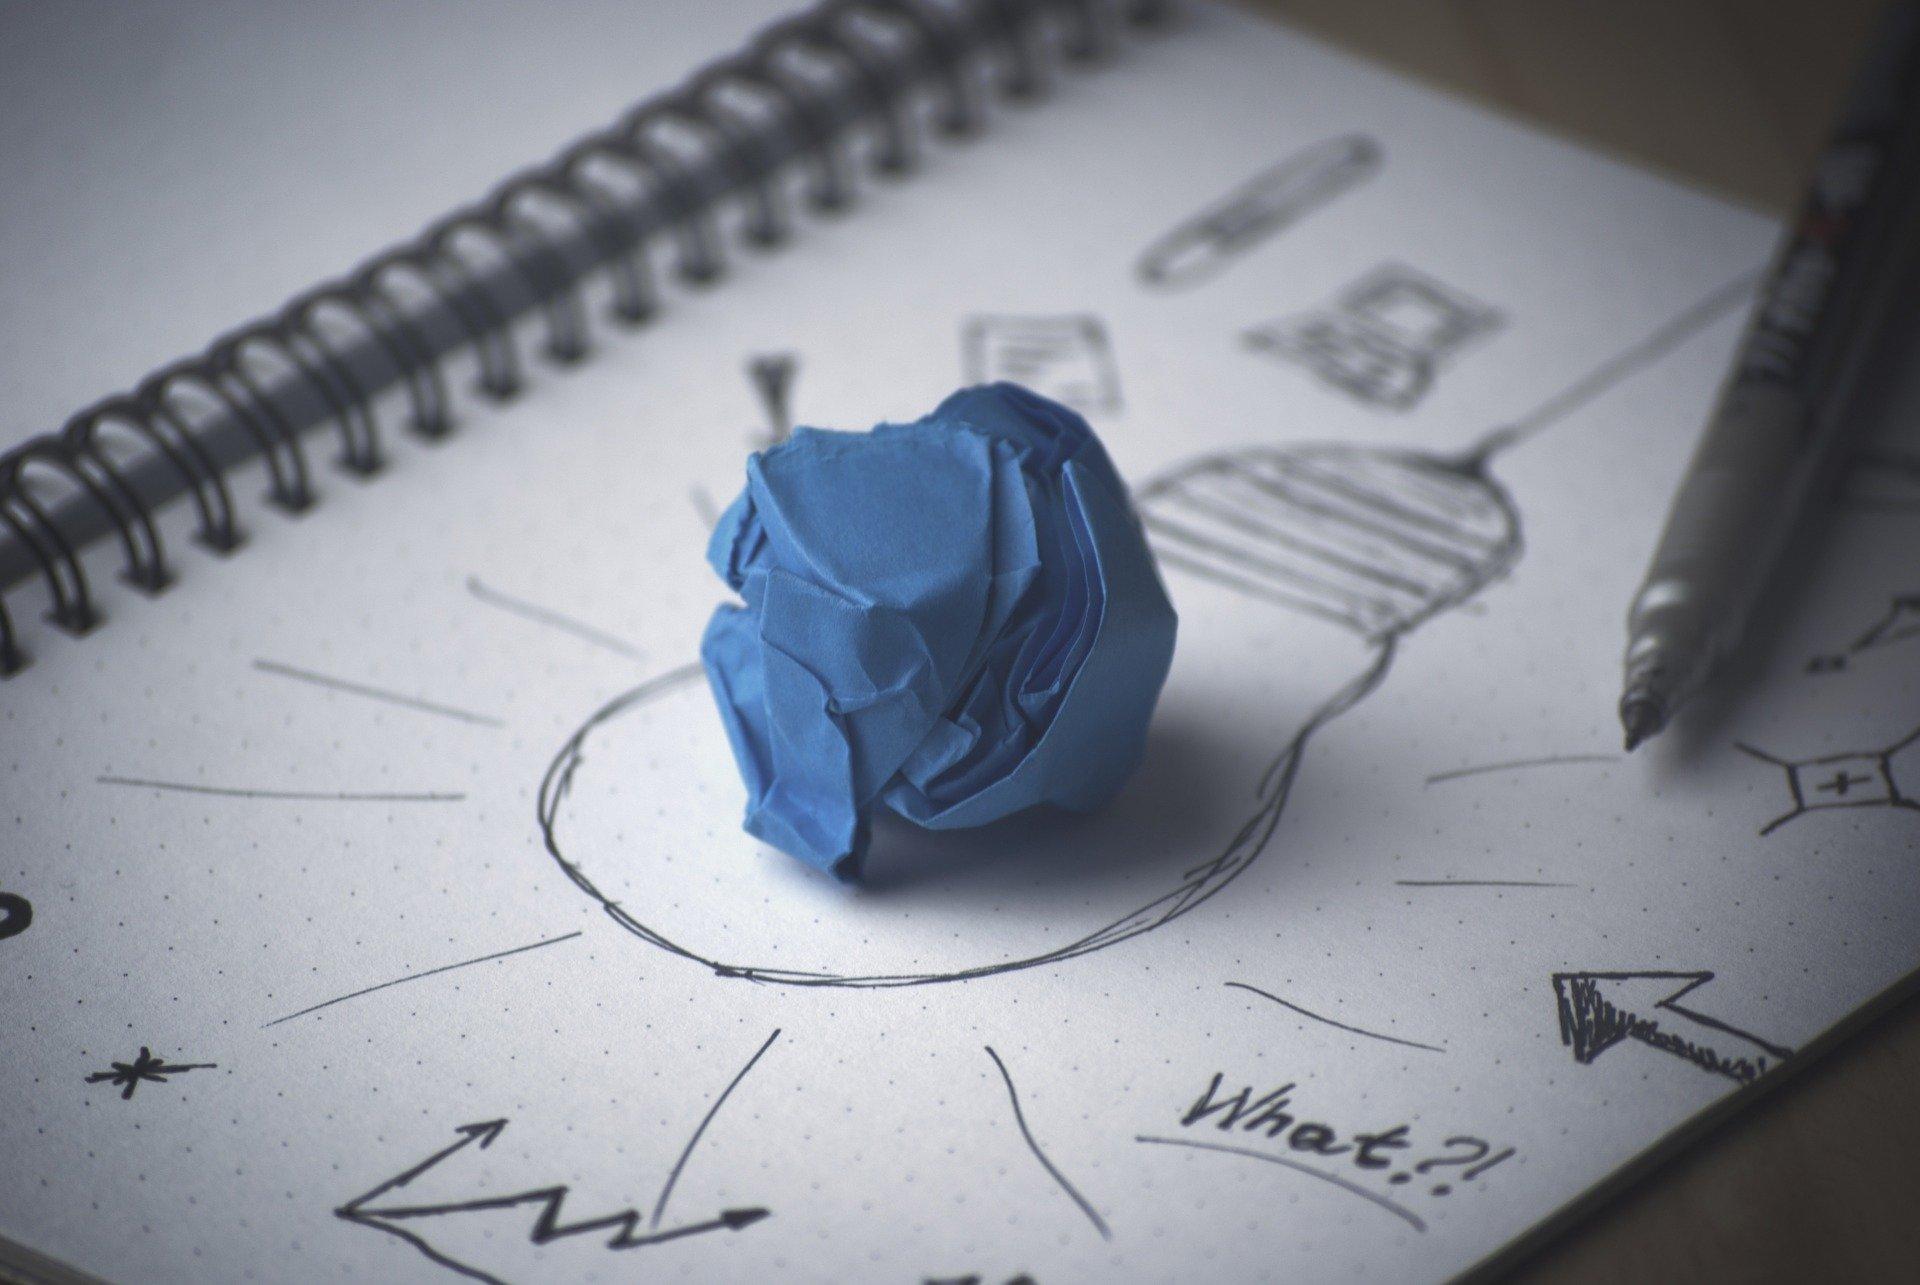 Creativity Idea Inspiration Innovation Pencil